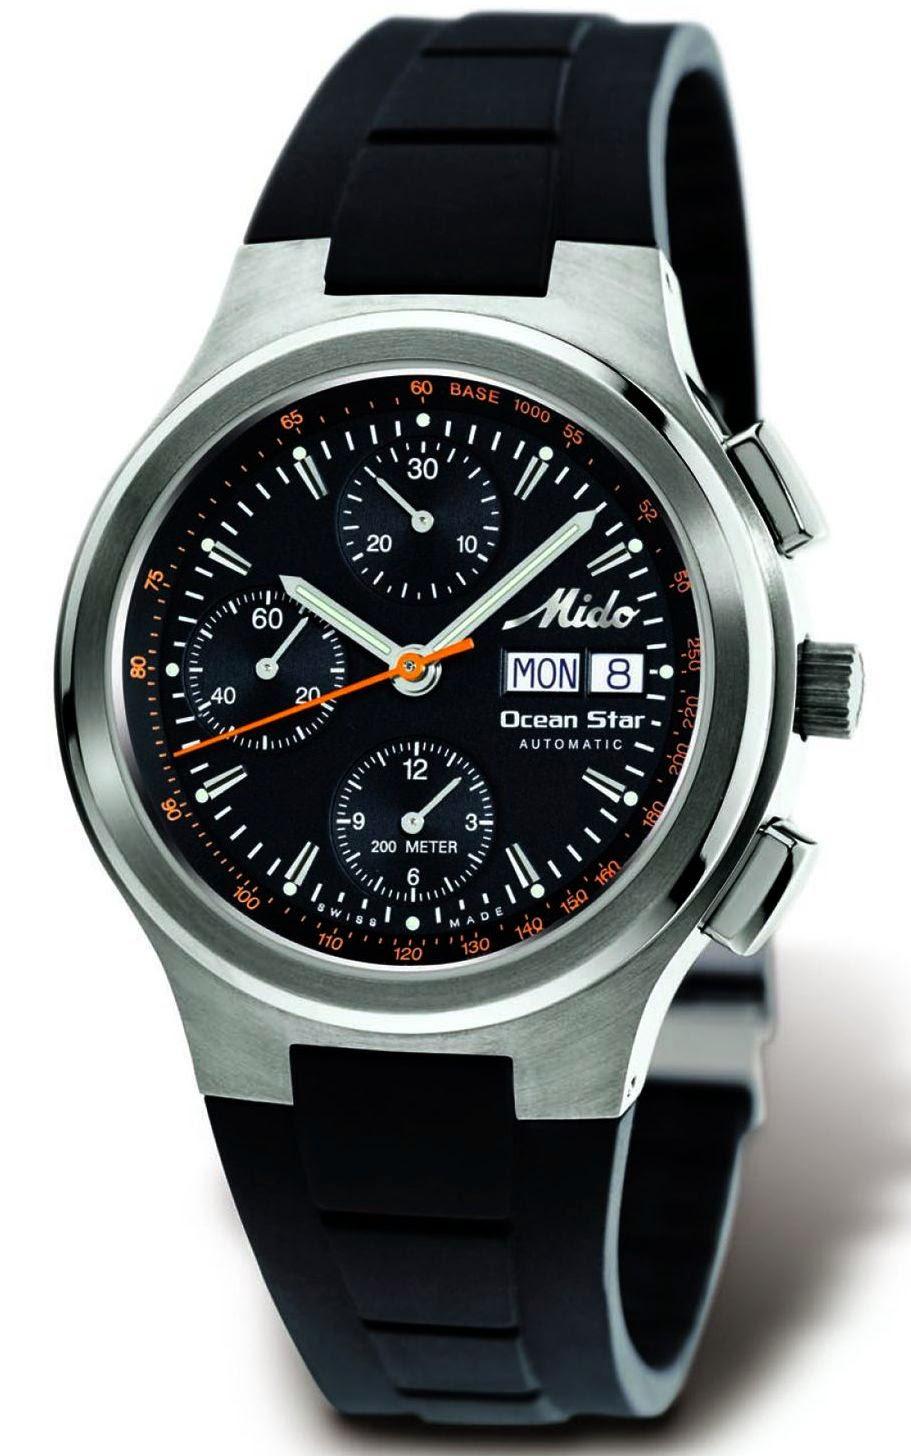 MIDO Ocean Star Sport Automatic Chronograph Titanium